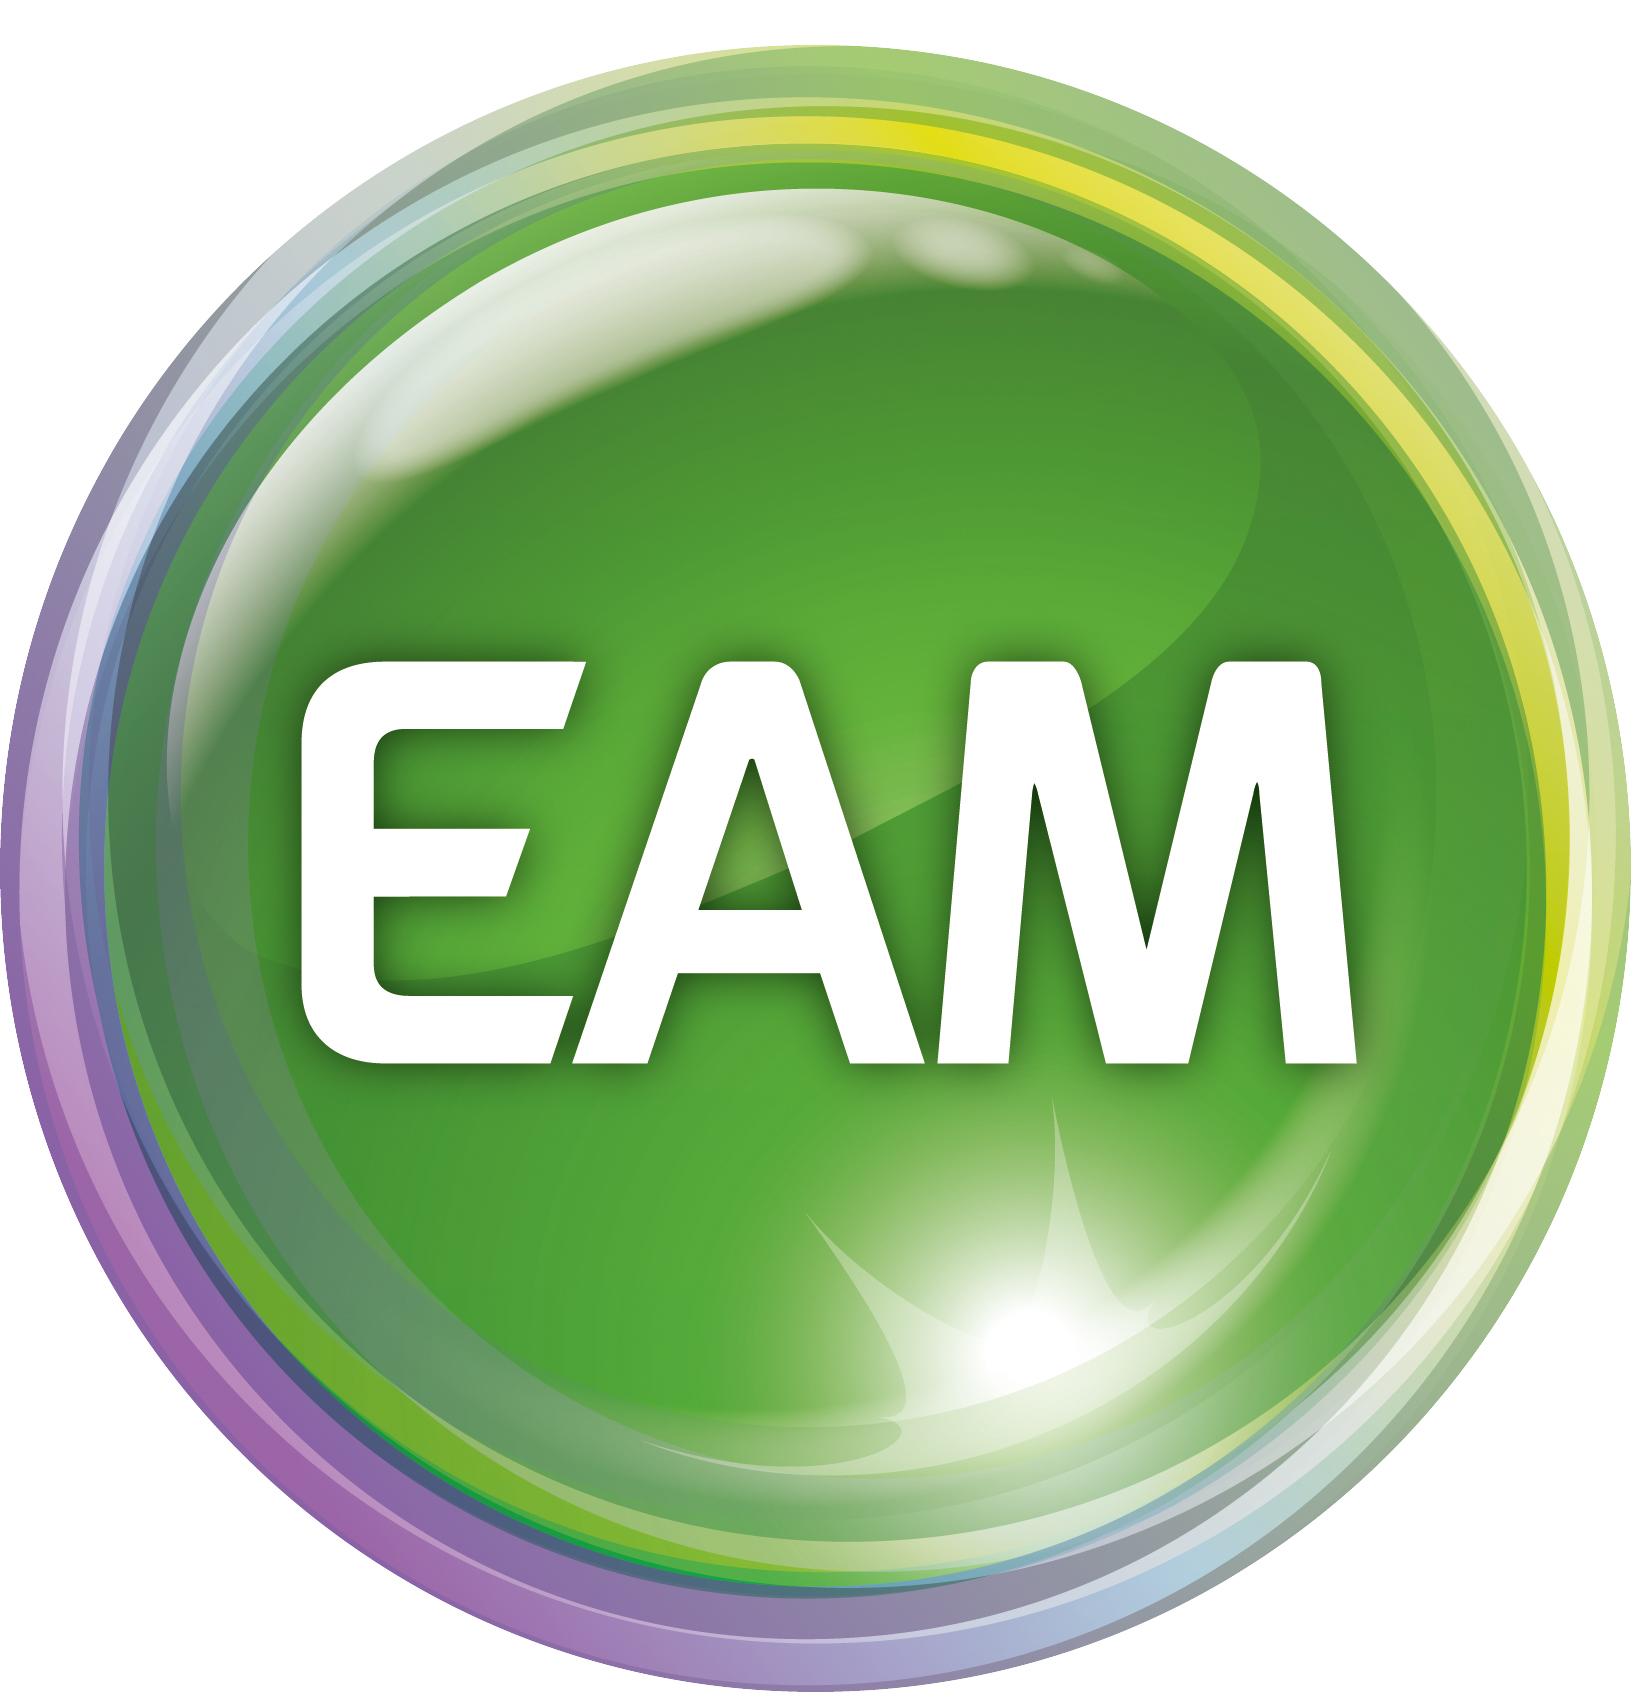 rz-eam-logo-3d.jpg